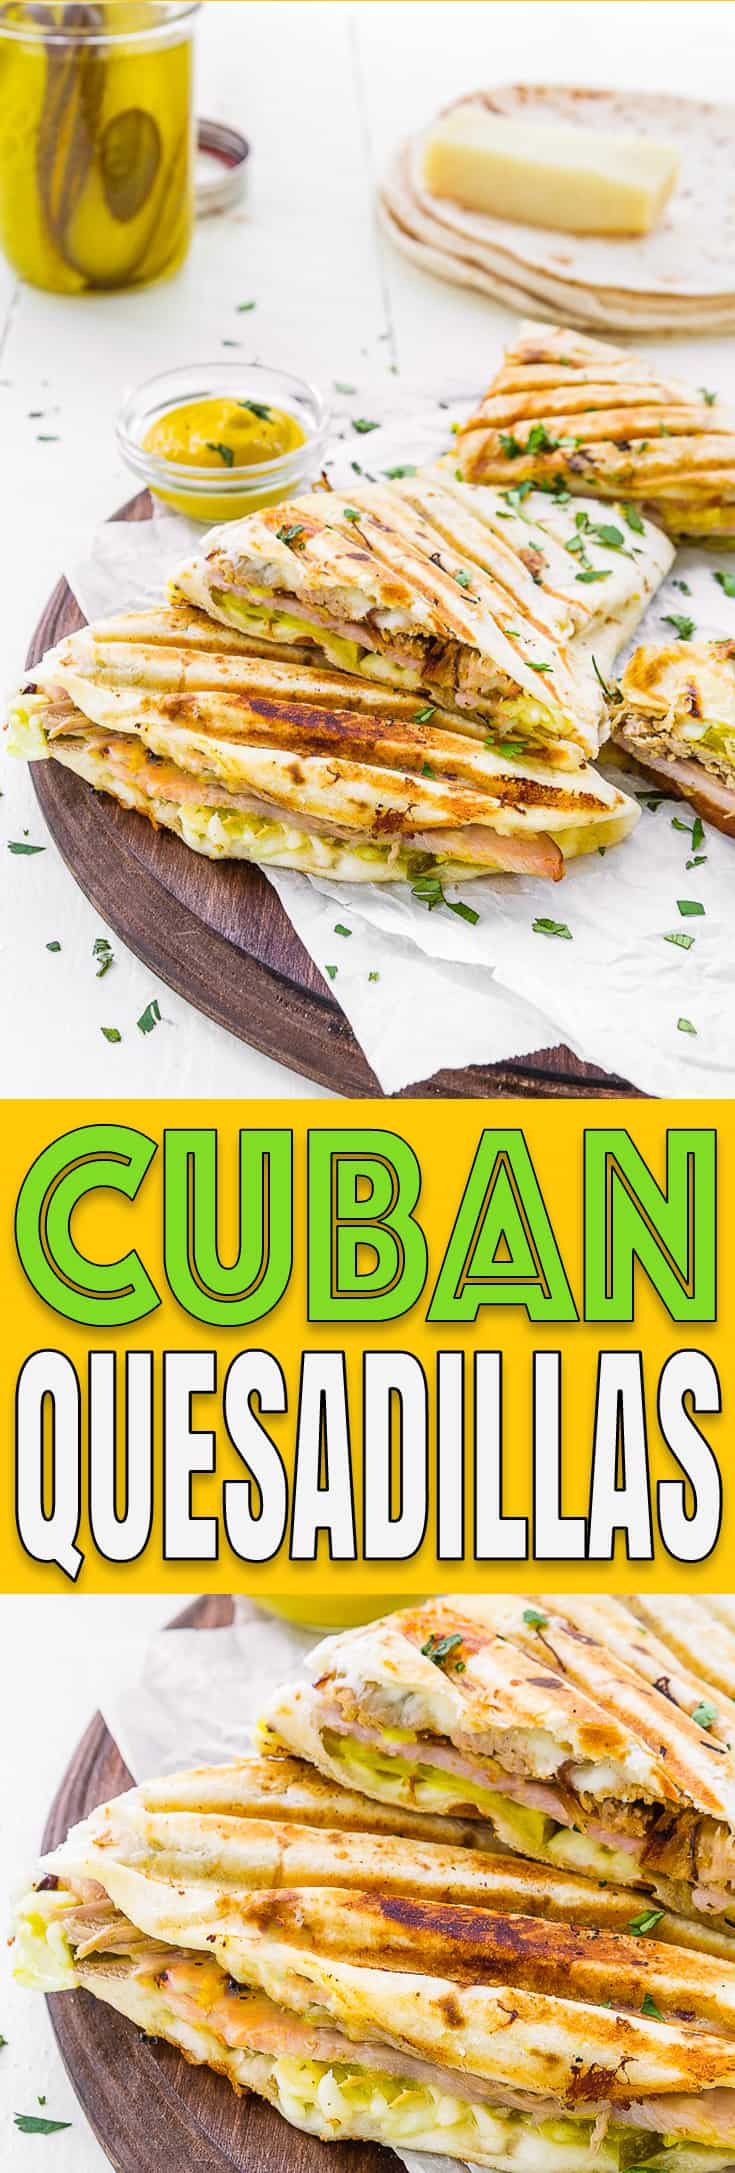 Cuban Quesadillas - #recipe #quesadilla #cuban #gamedayfood #sandwich